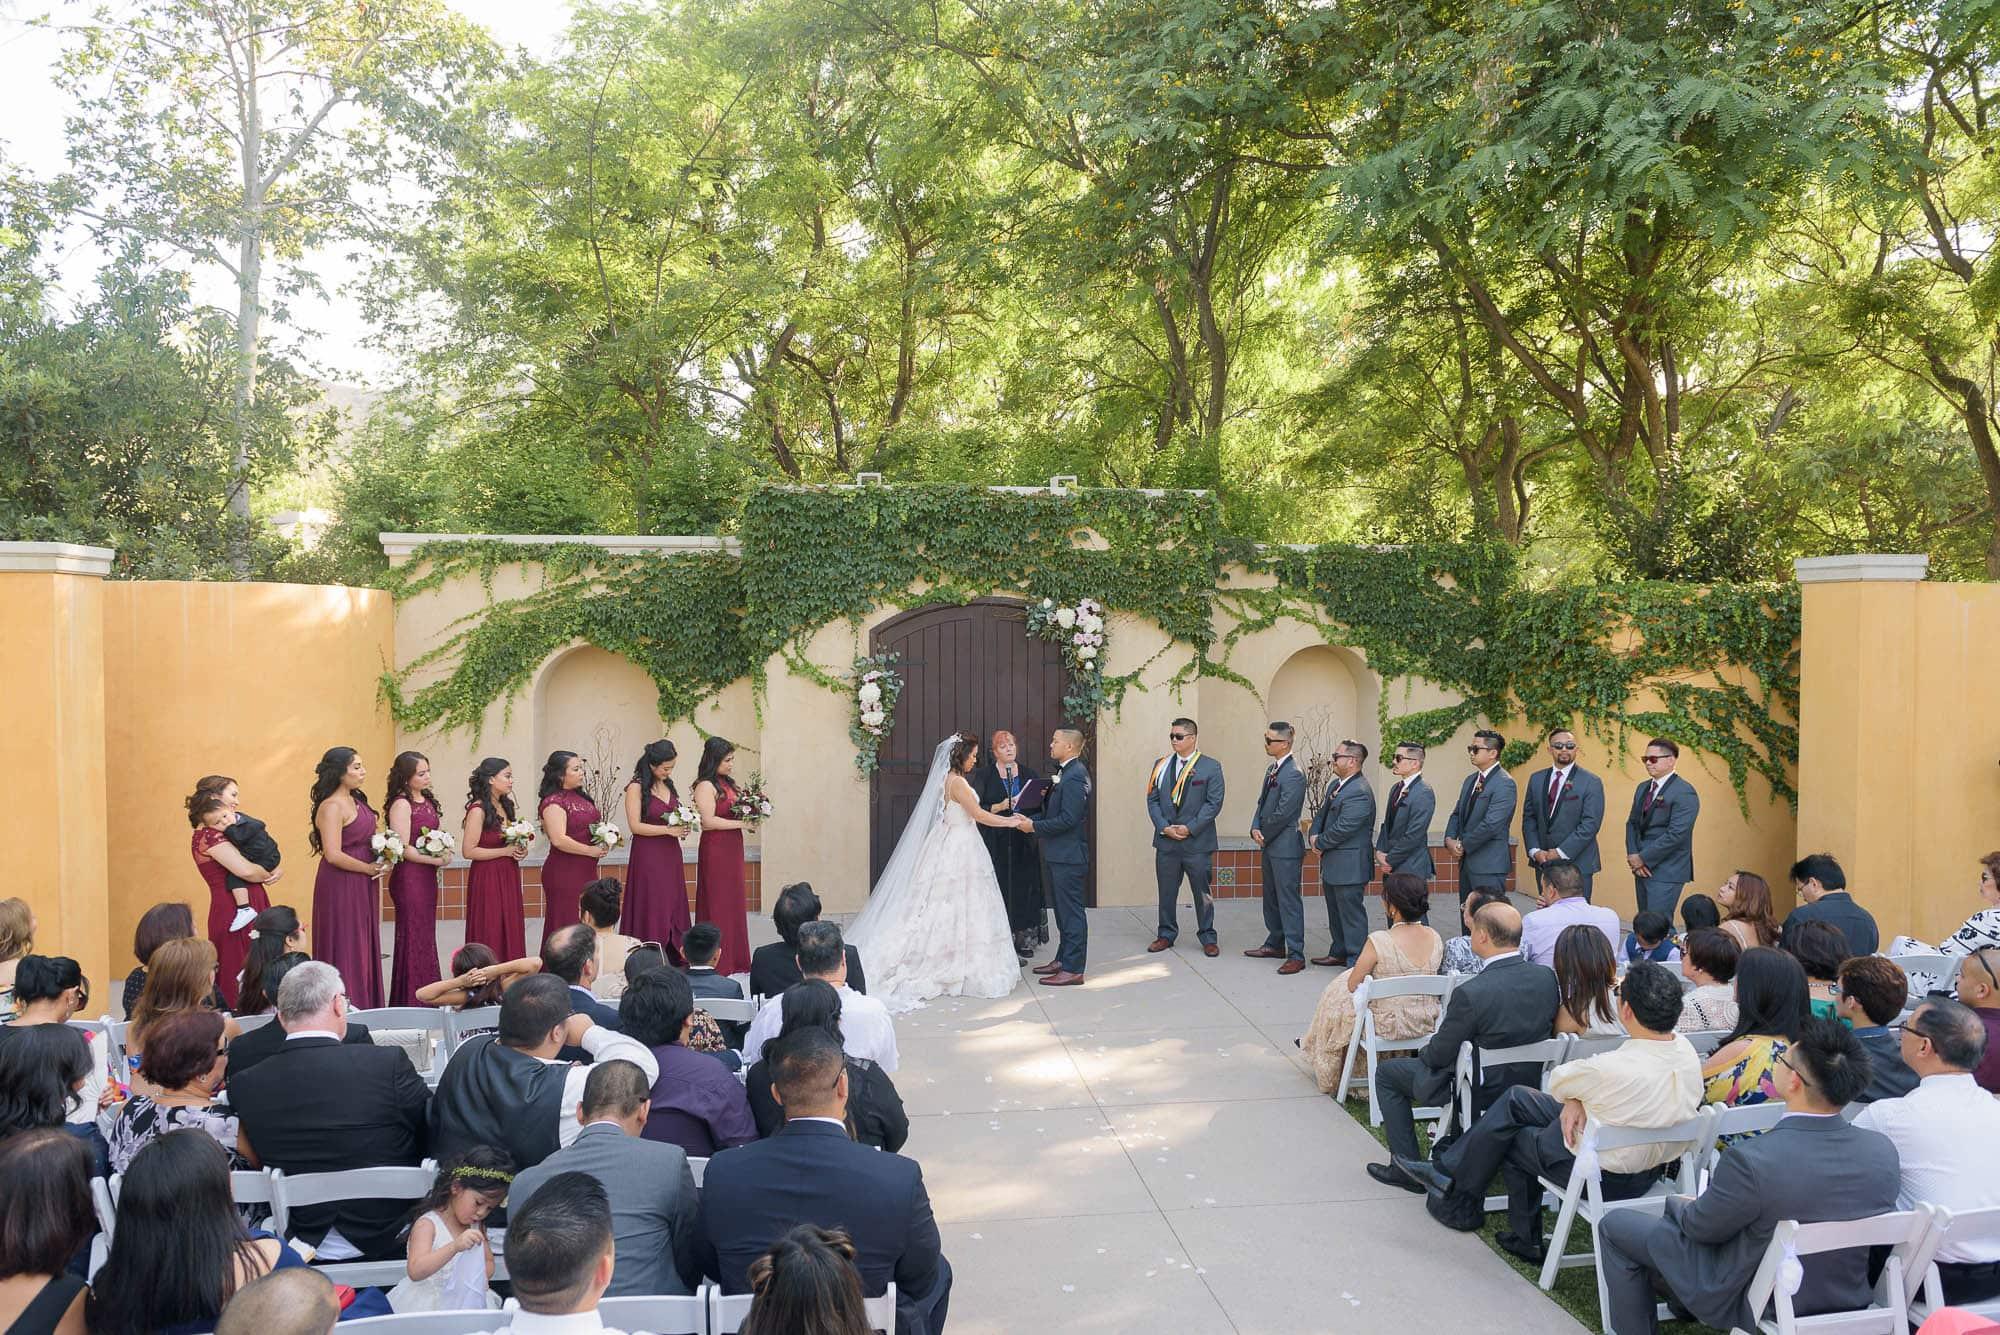 019_Alan_and_Heidi_Wedding_Karla_Paolo